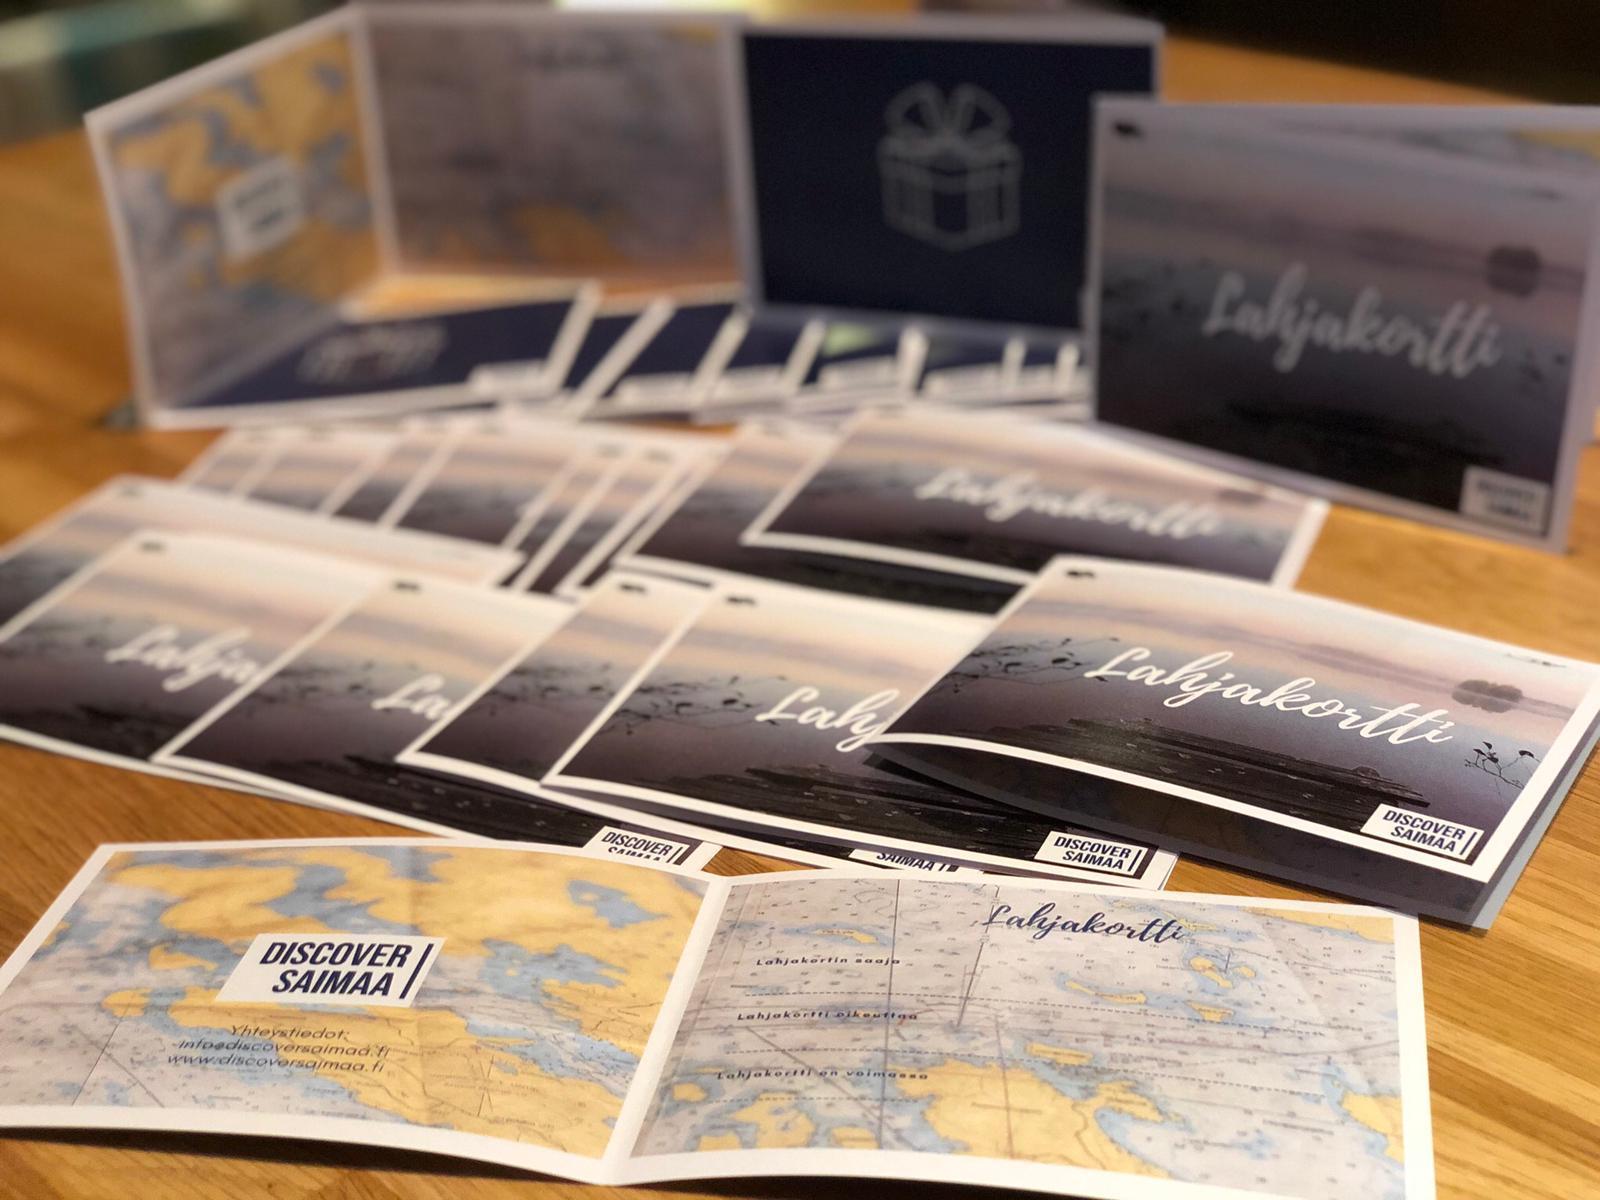 Discover Saimaa lahjakortit